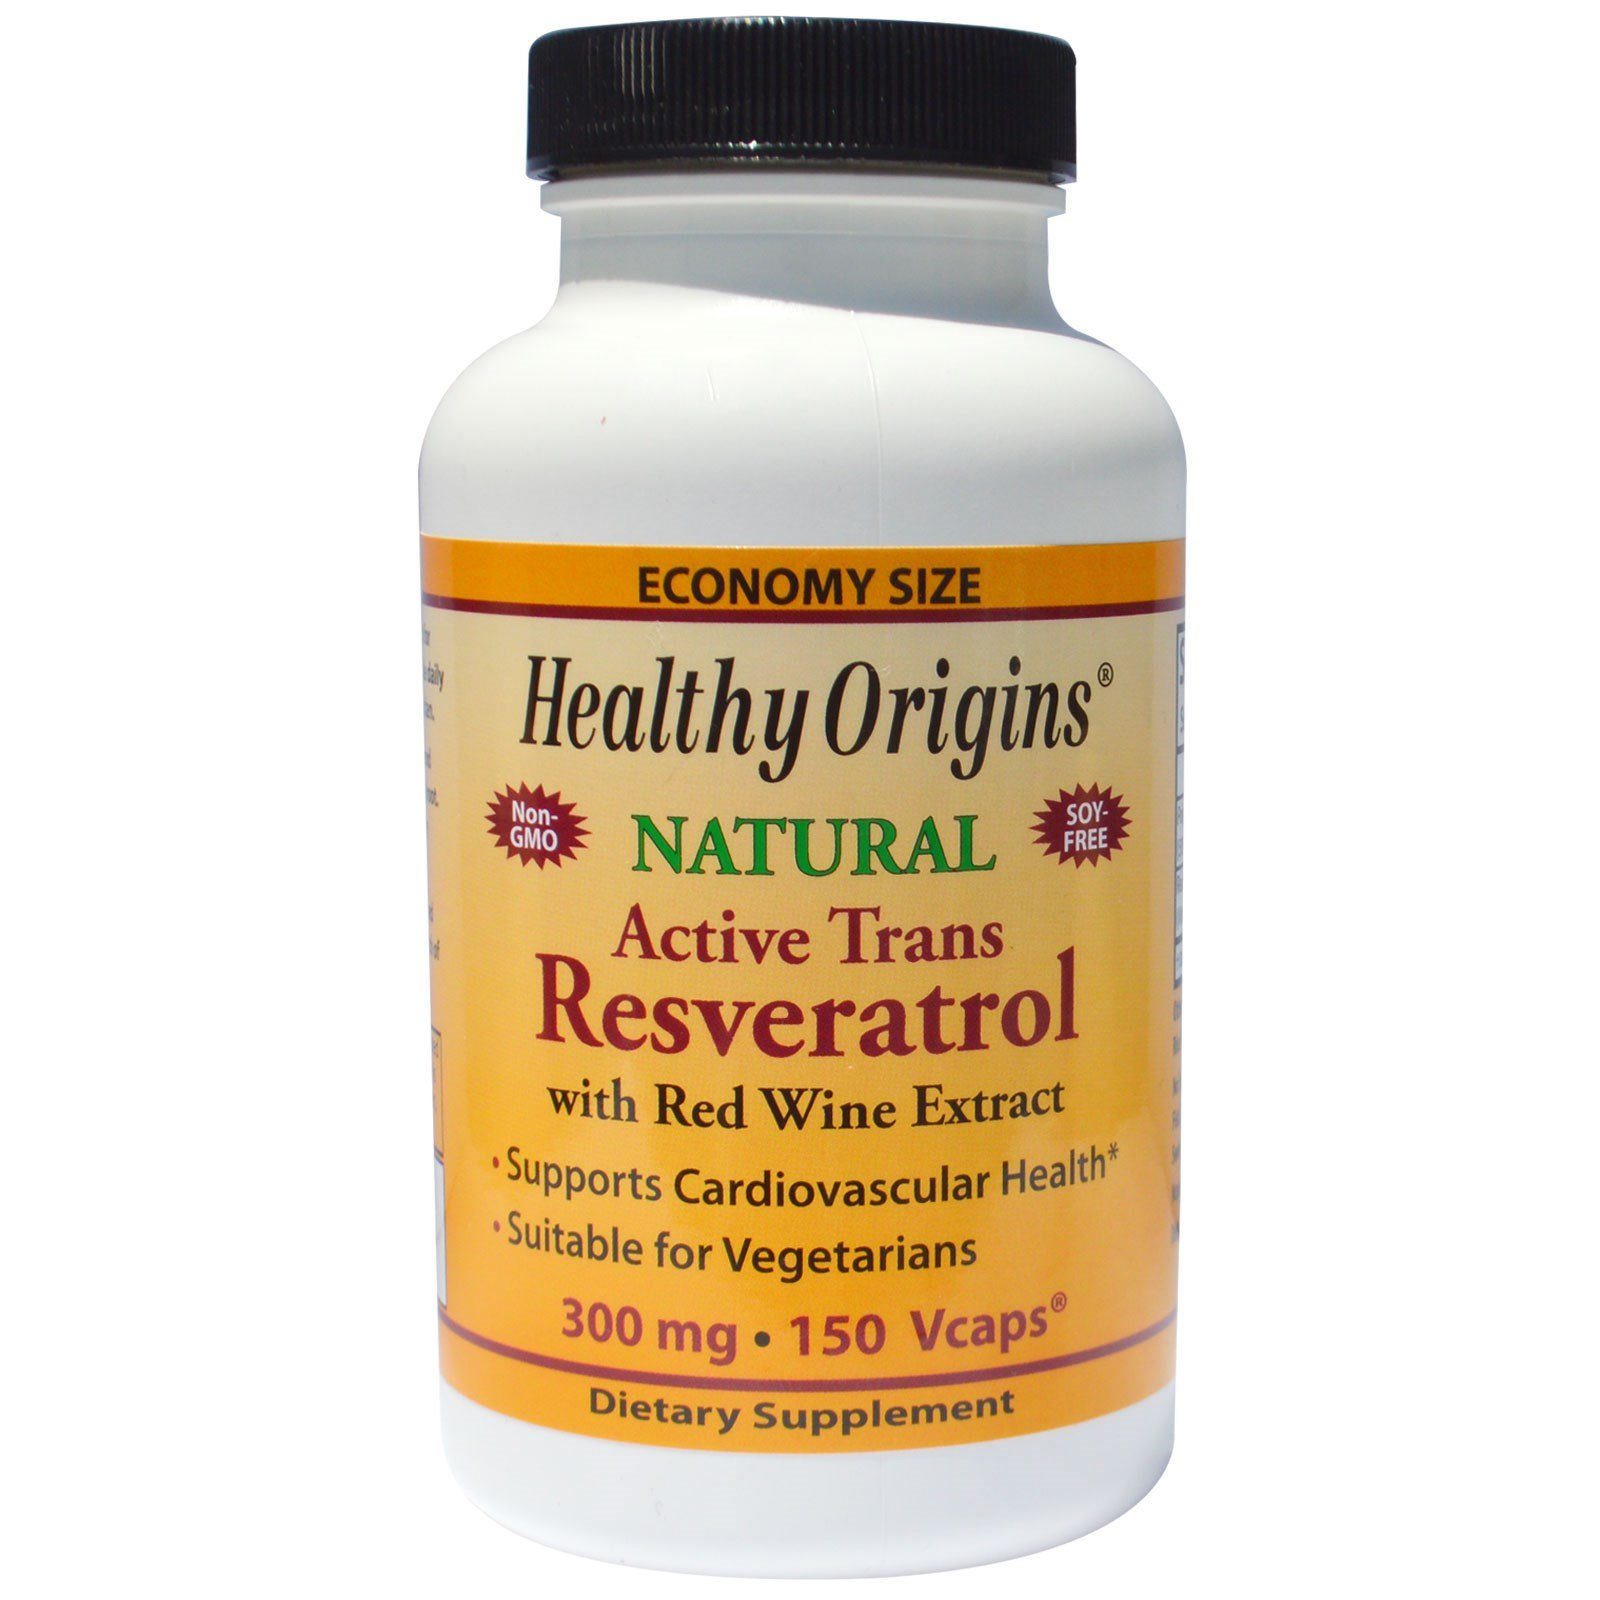 Healthy Origins, Active Trans Resveratrol, 300 mg, 150 Veggie Caps - 2pc